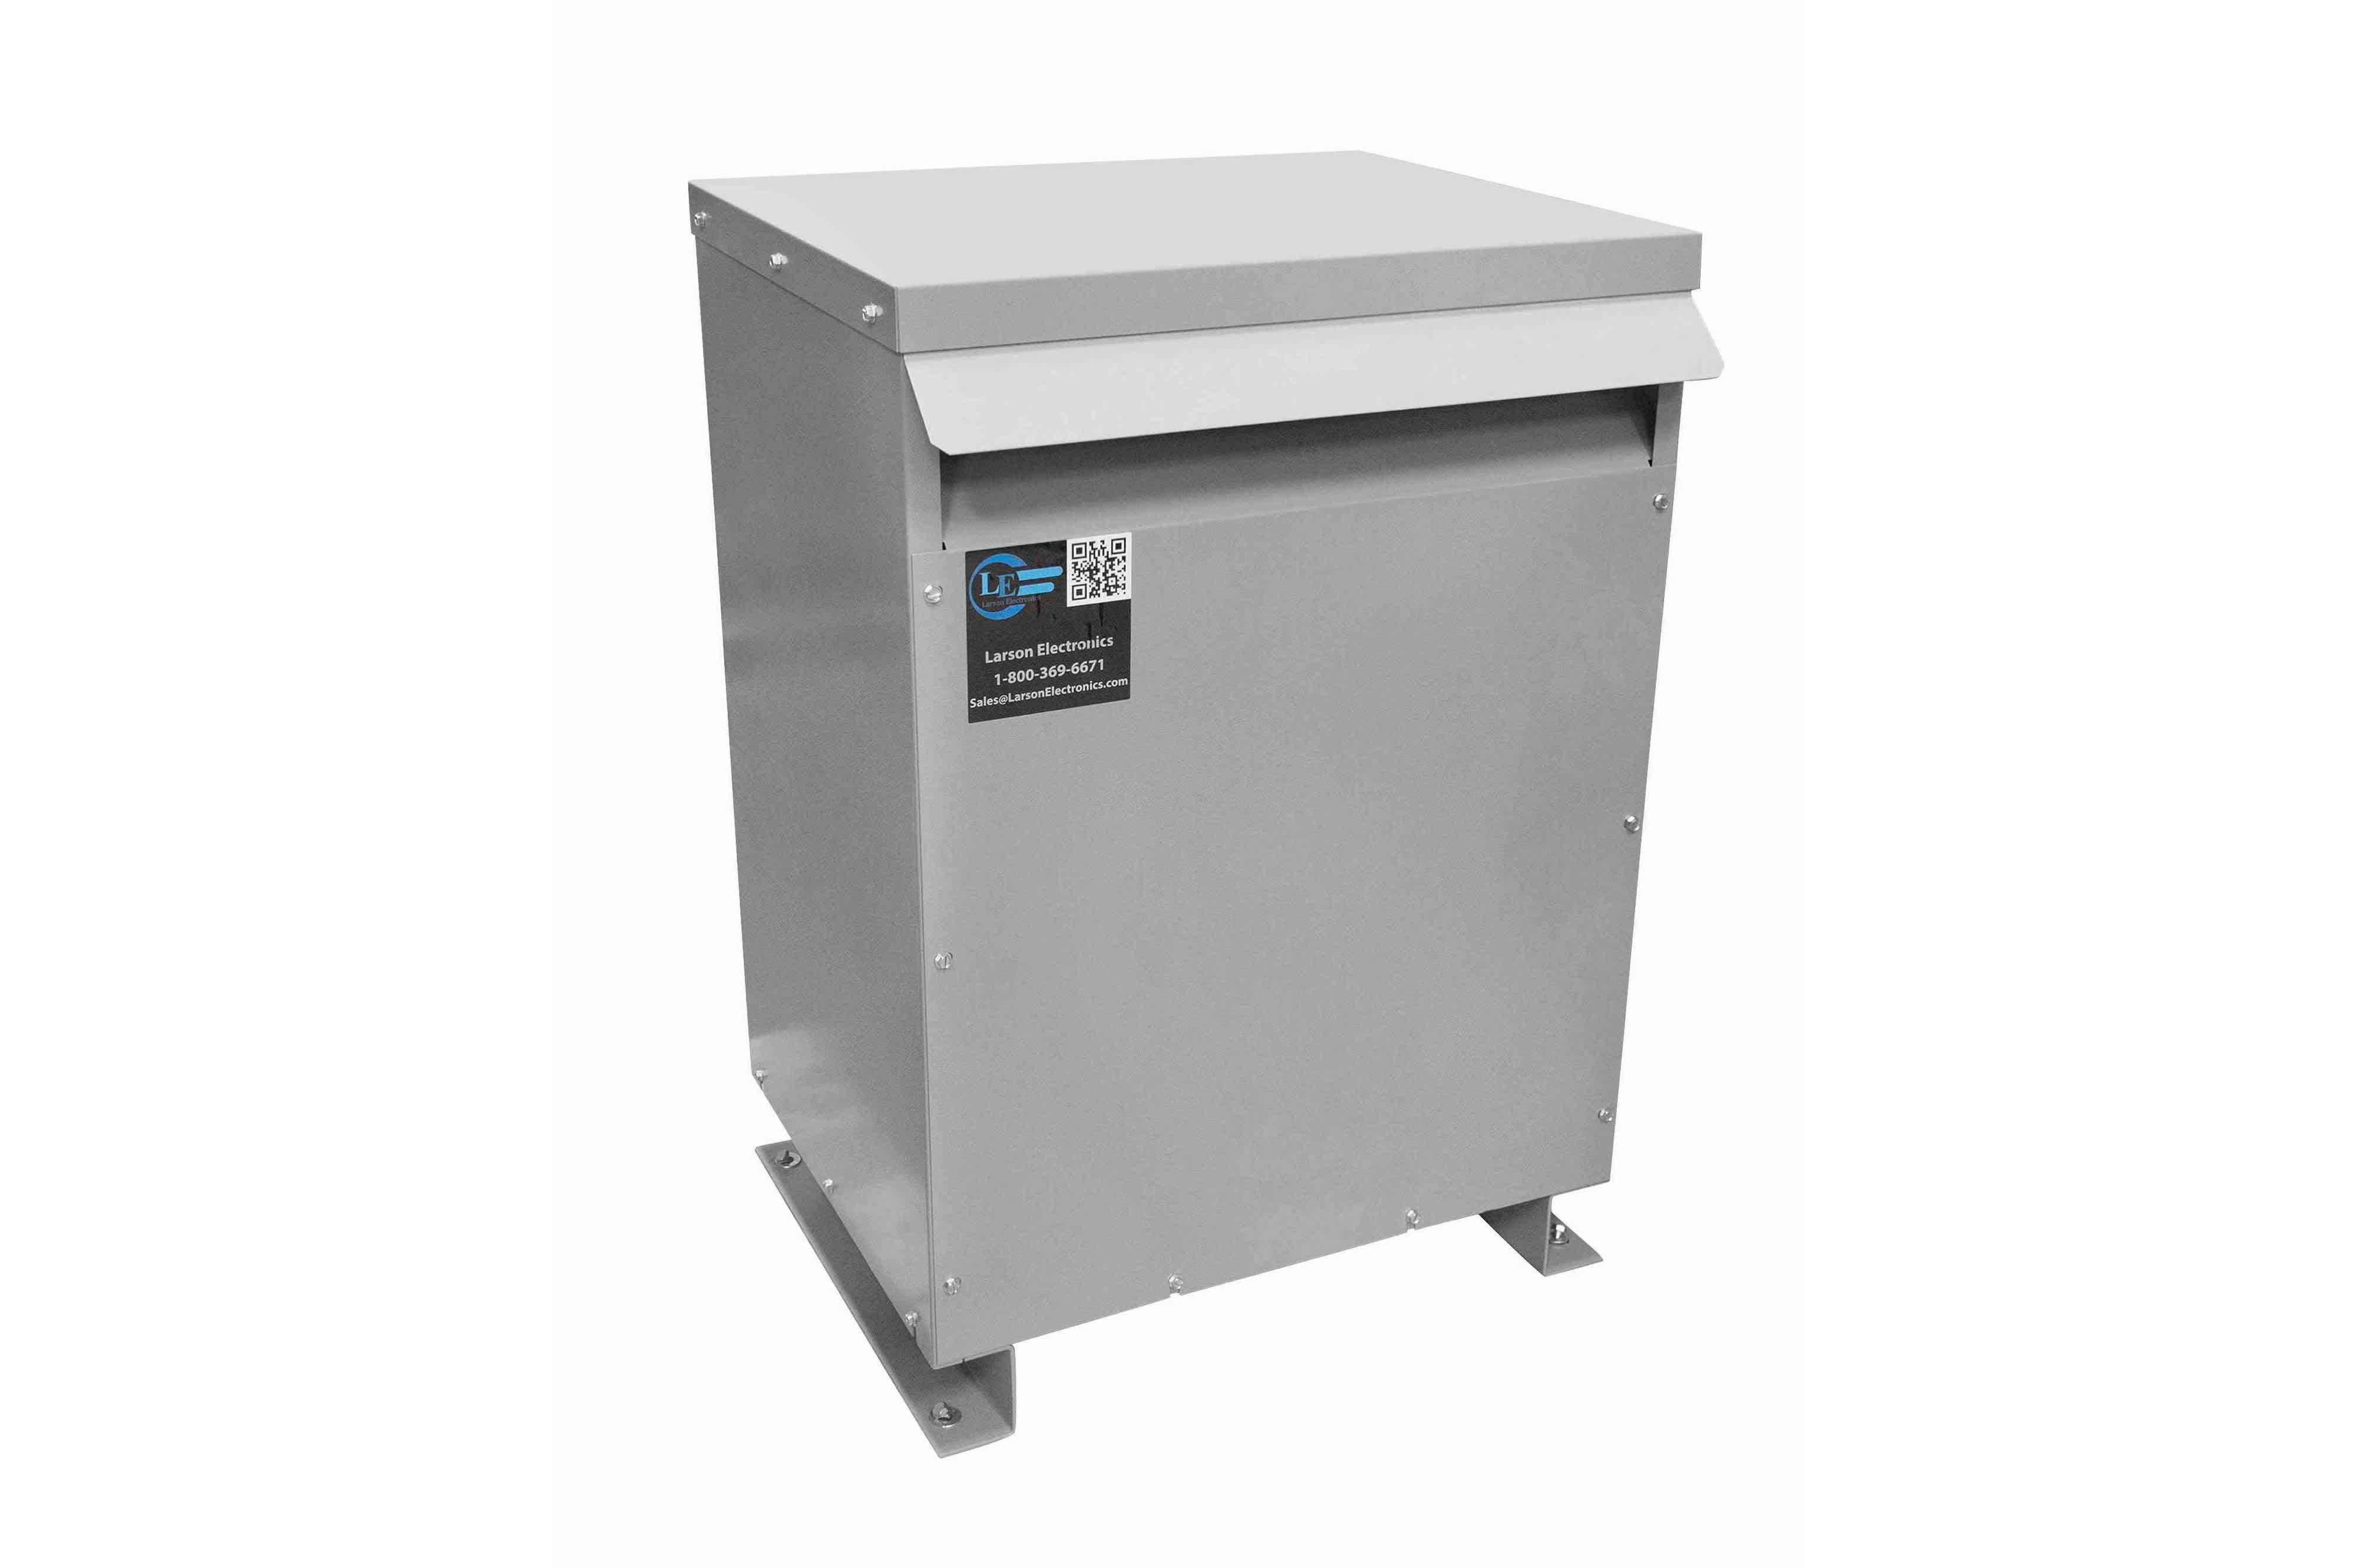 110 kVA 3PH Isolation Transformer, 575V Wye Primary, 208Y/120 Wye-N Secondary, N3R, Ventilated, 60 Hz